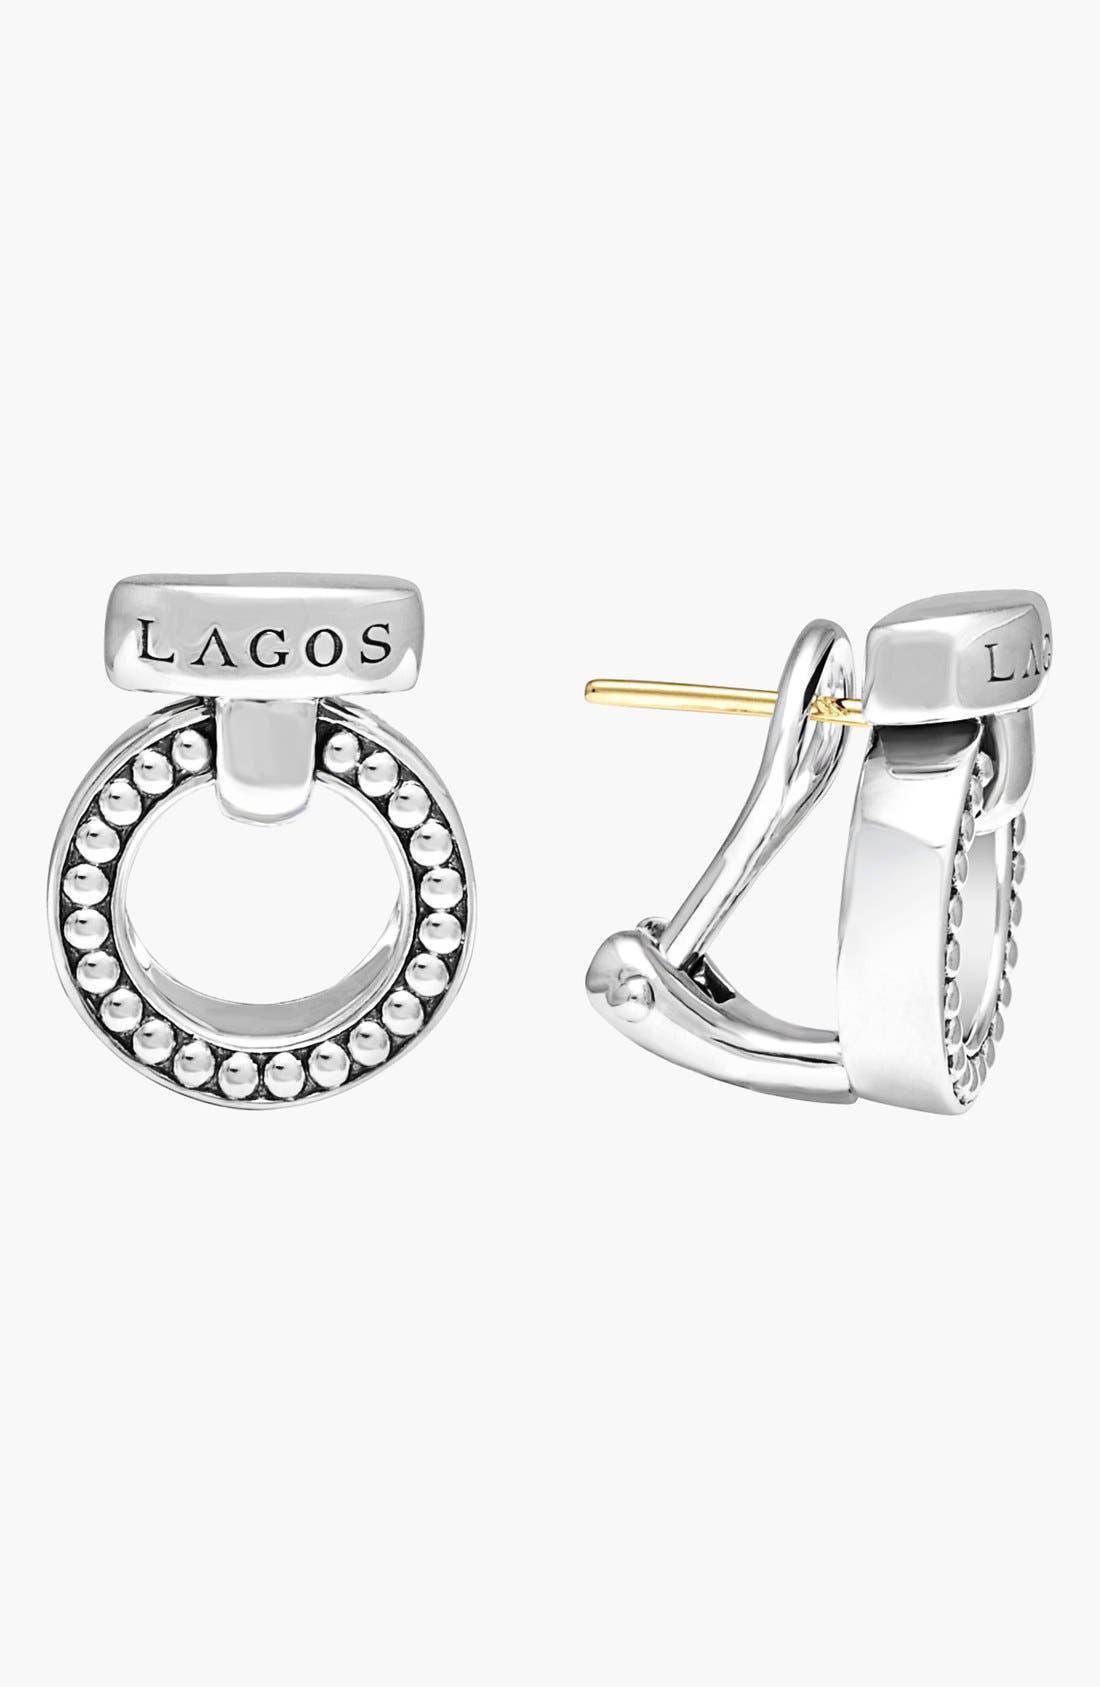 LAGOS 'Enso' Caviar™ Clip Earrings